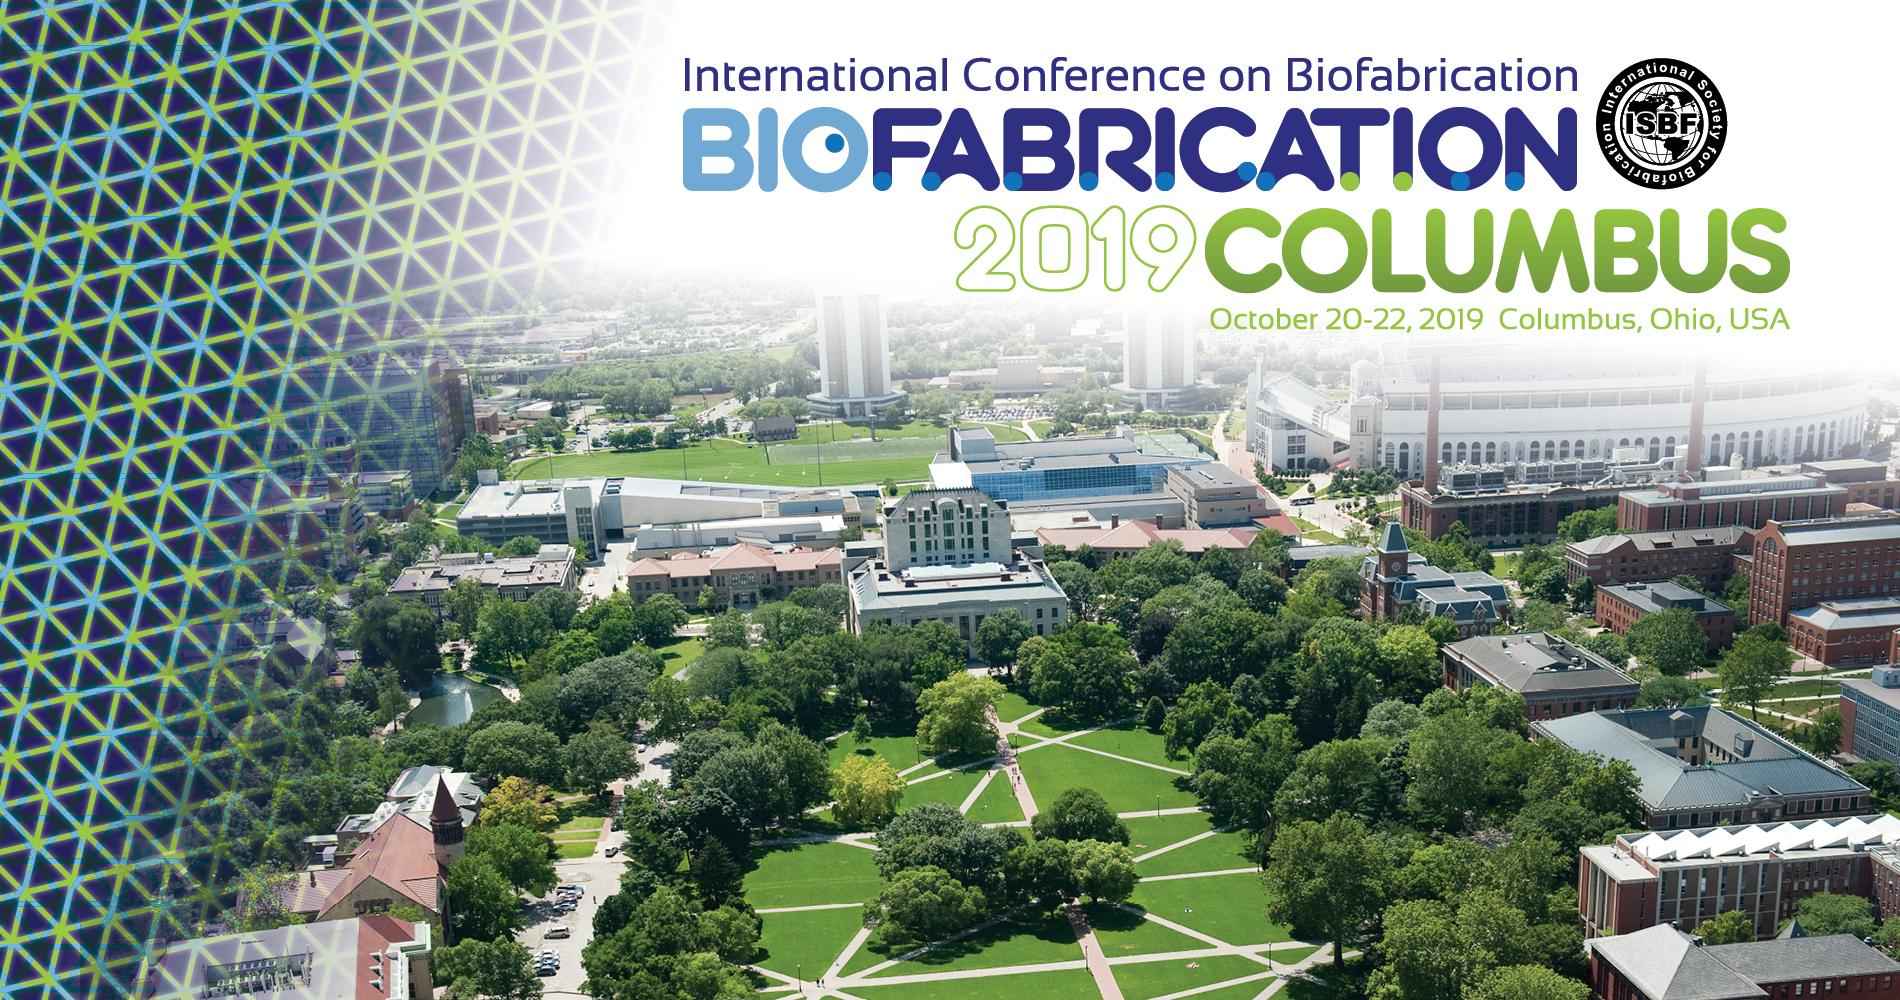 Biofabrication 2019